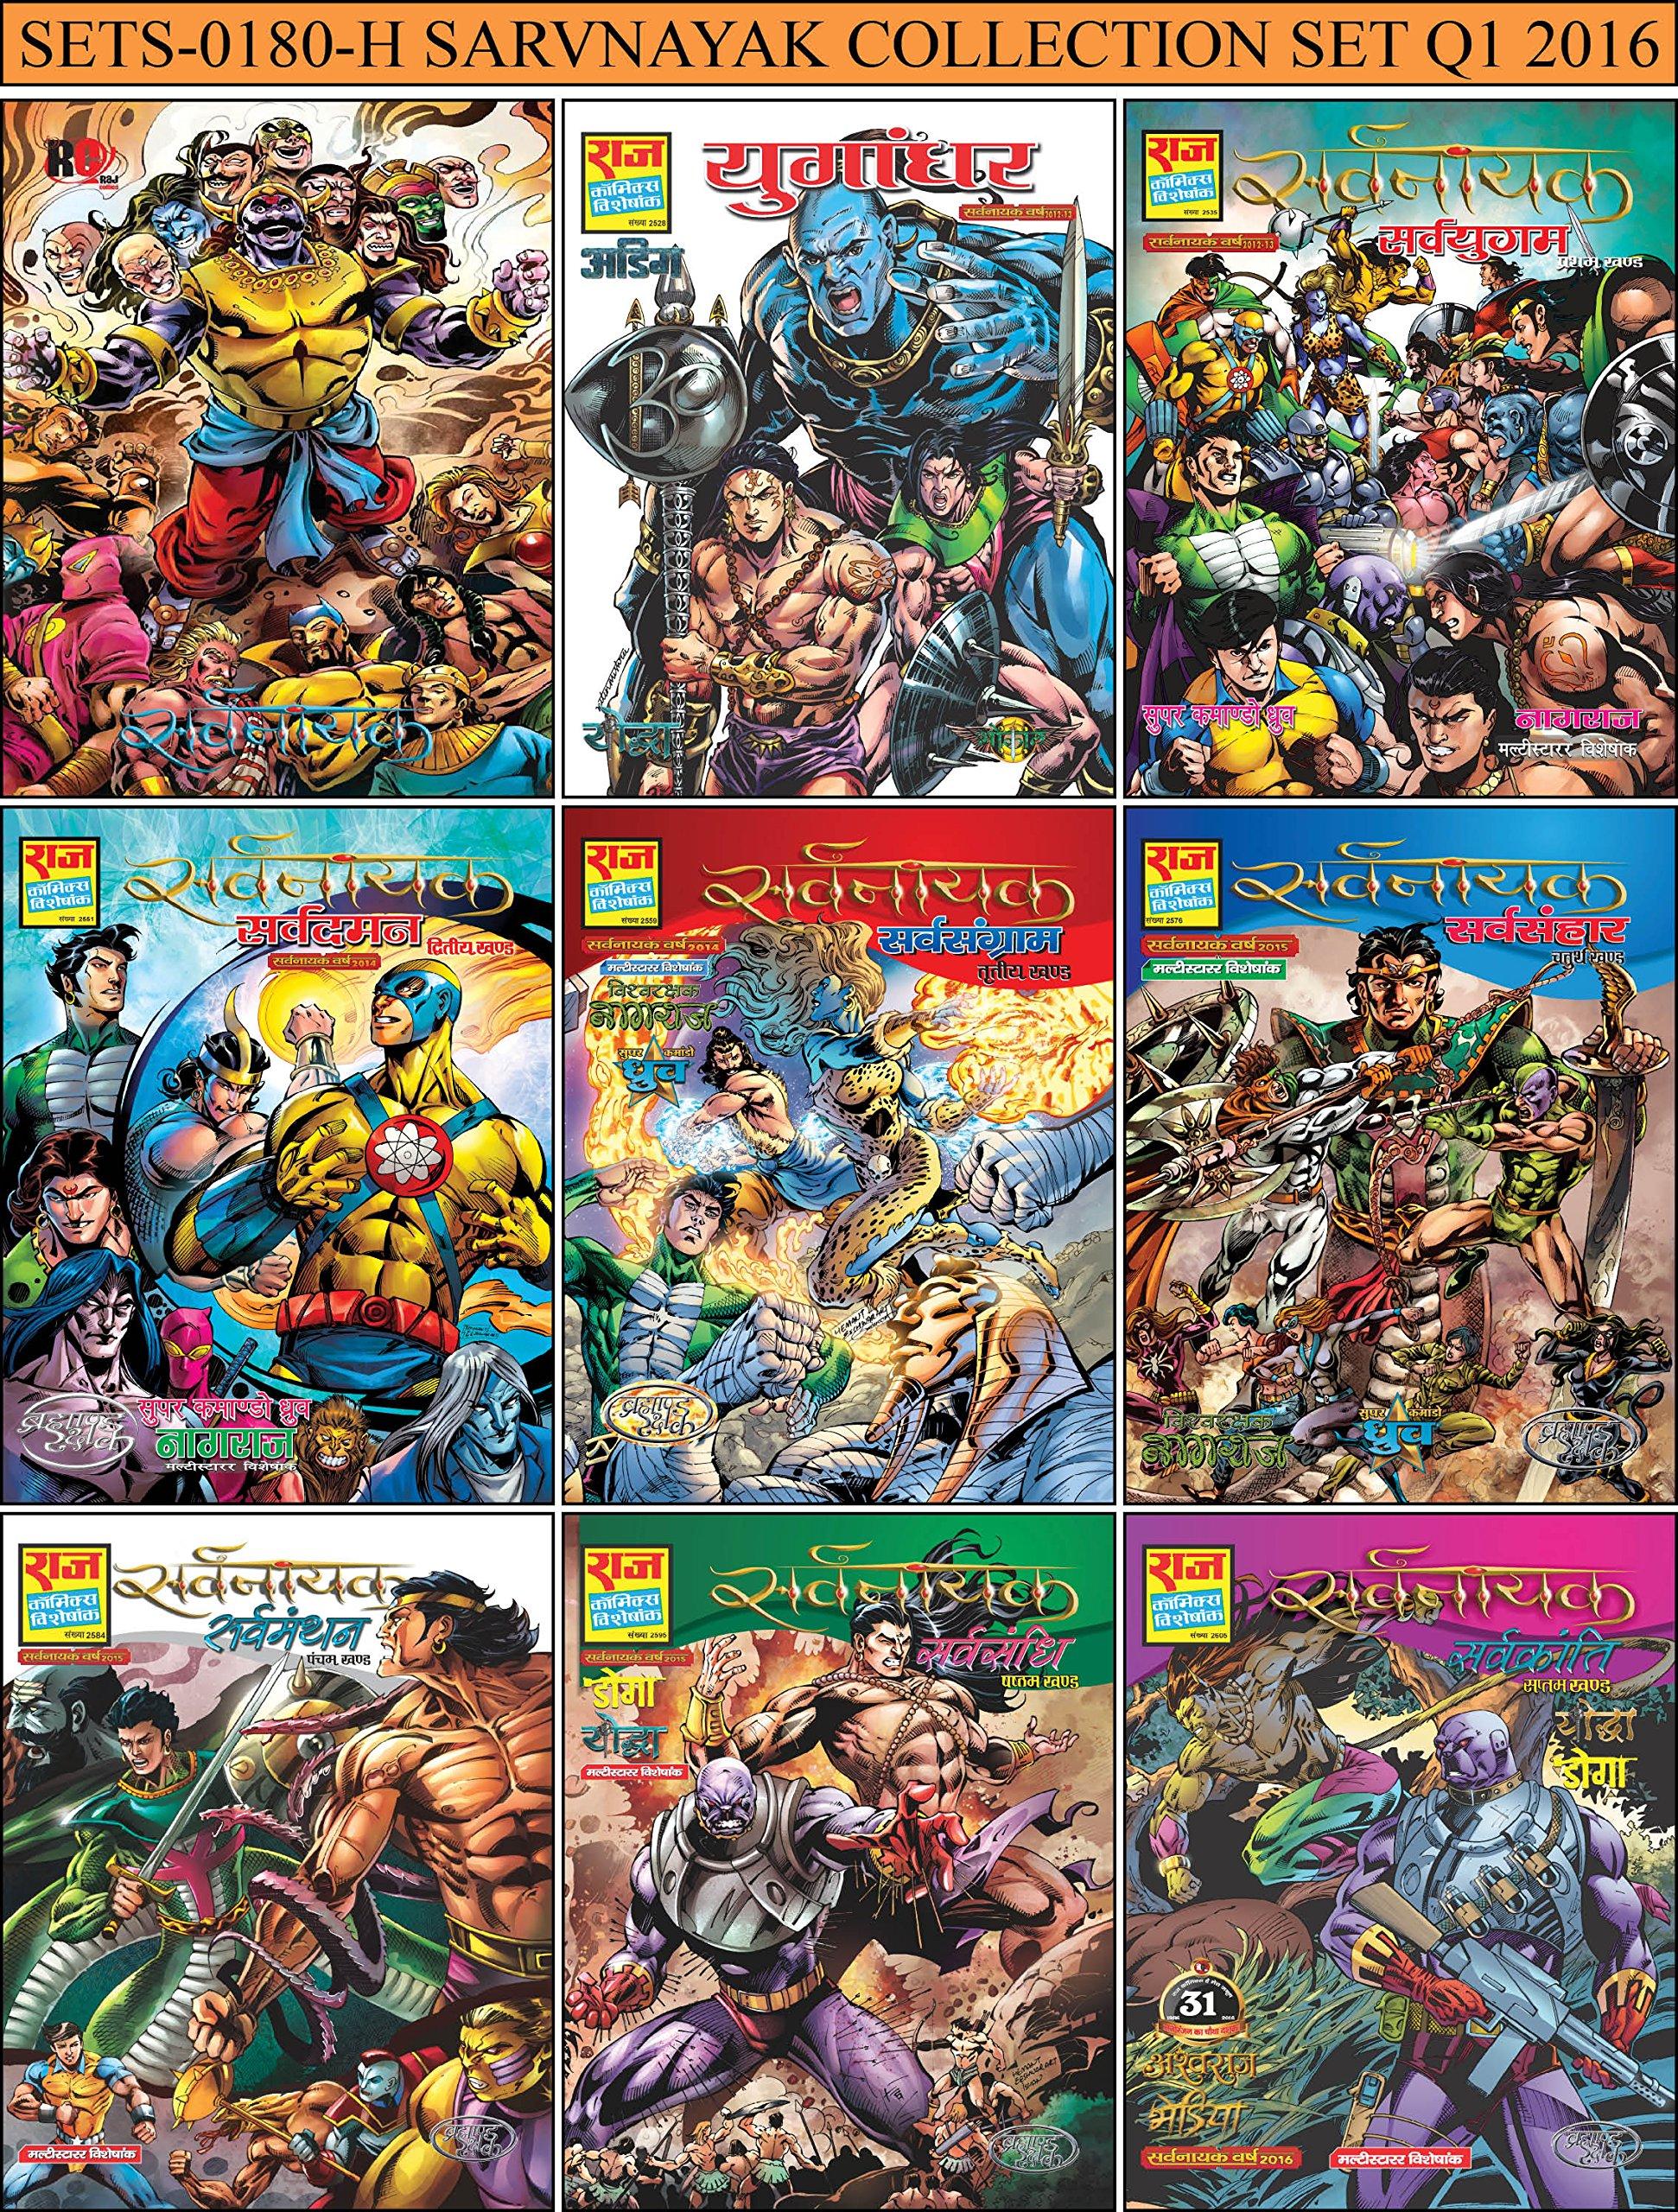 Of pdf raj comics file